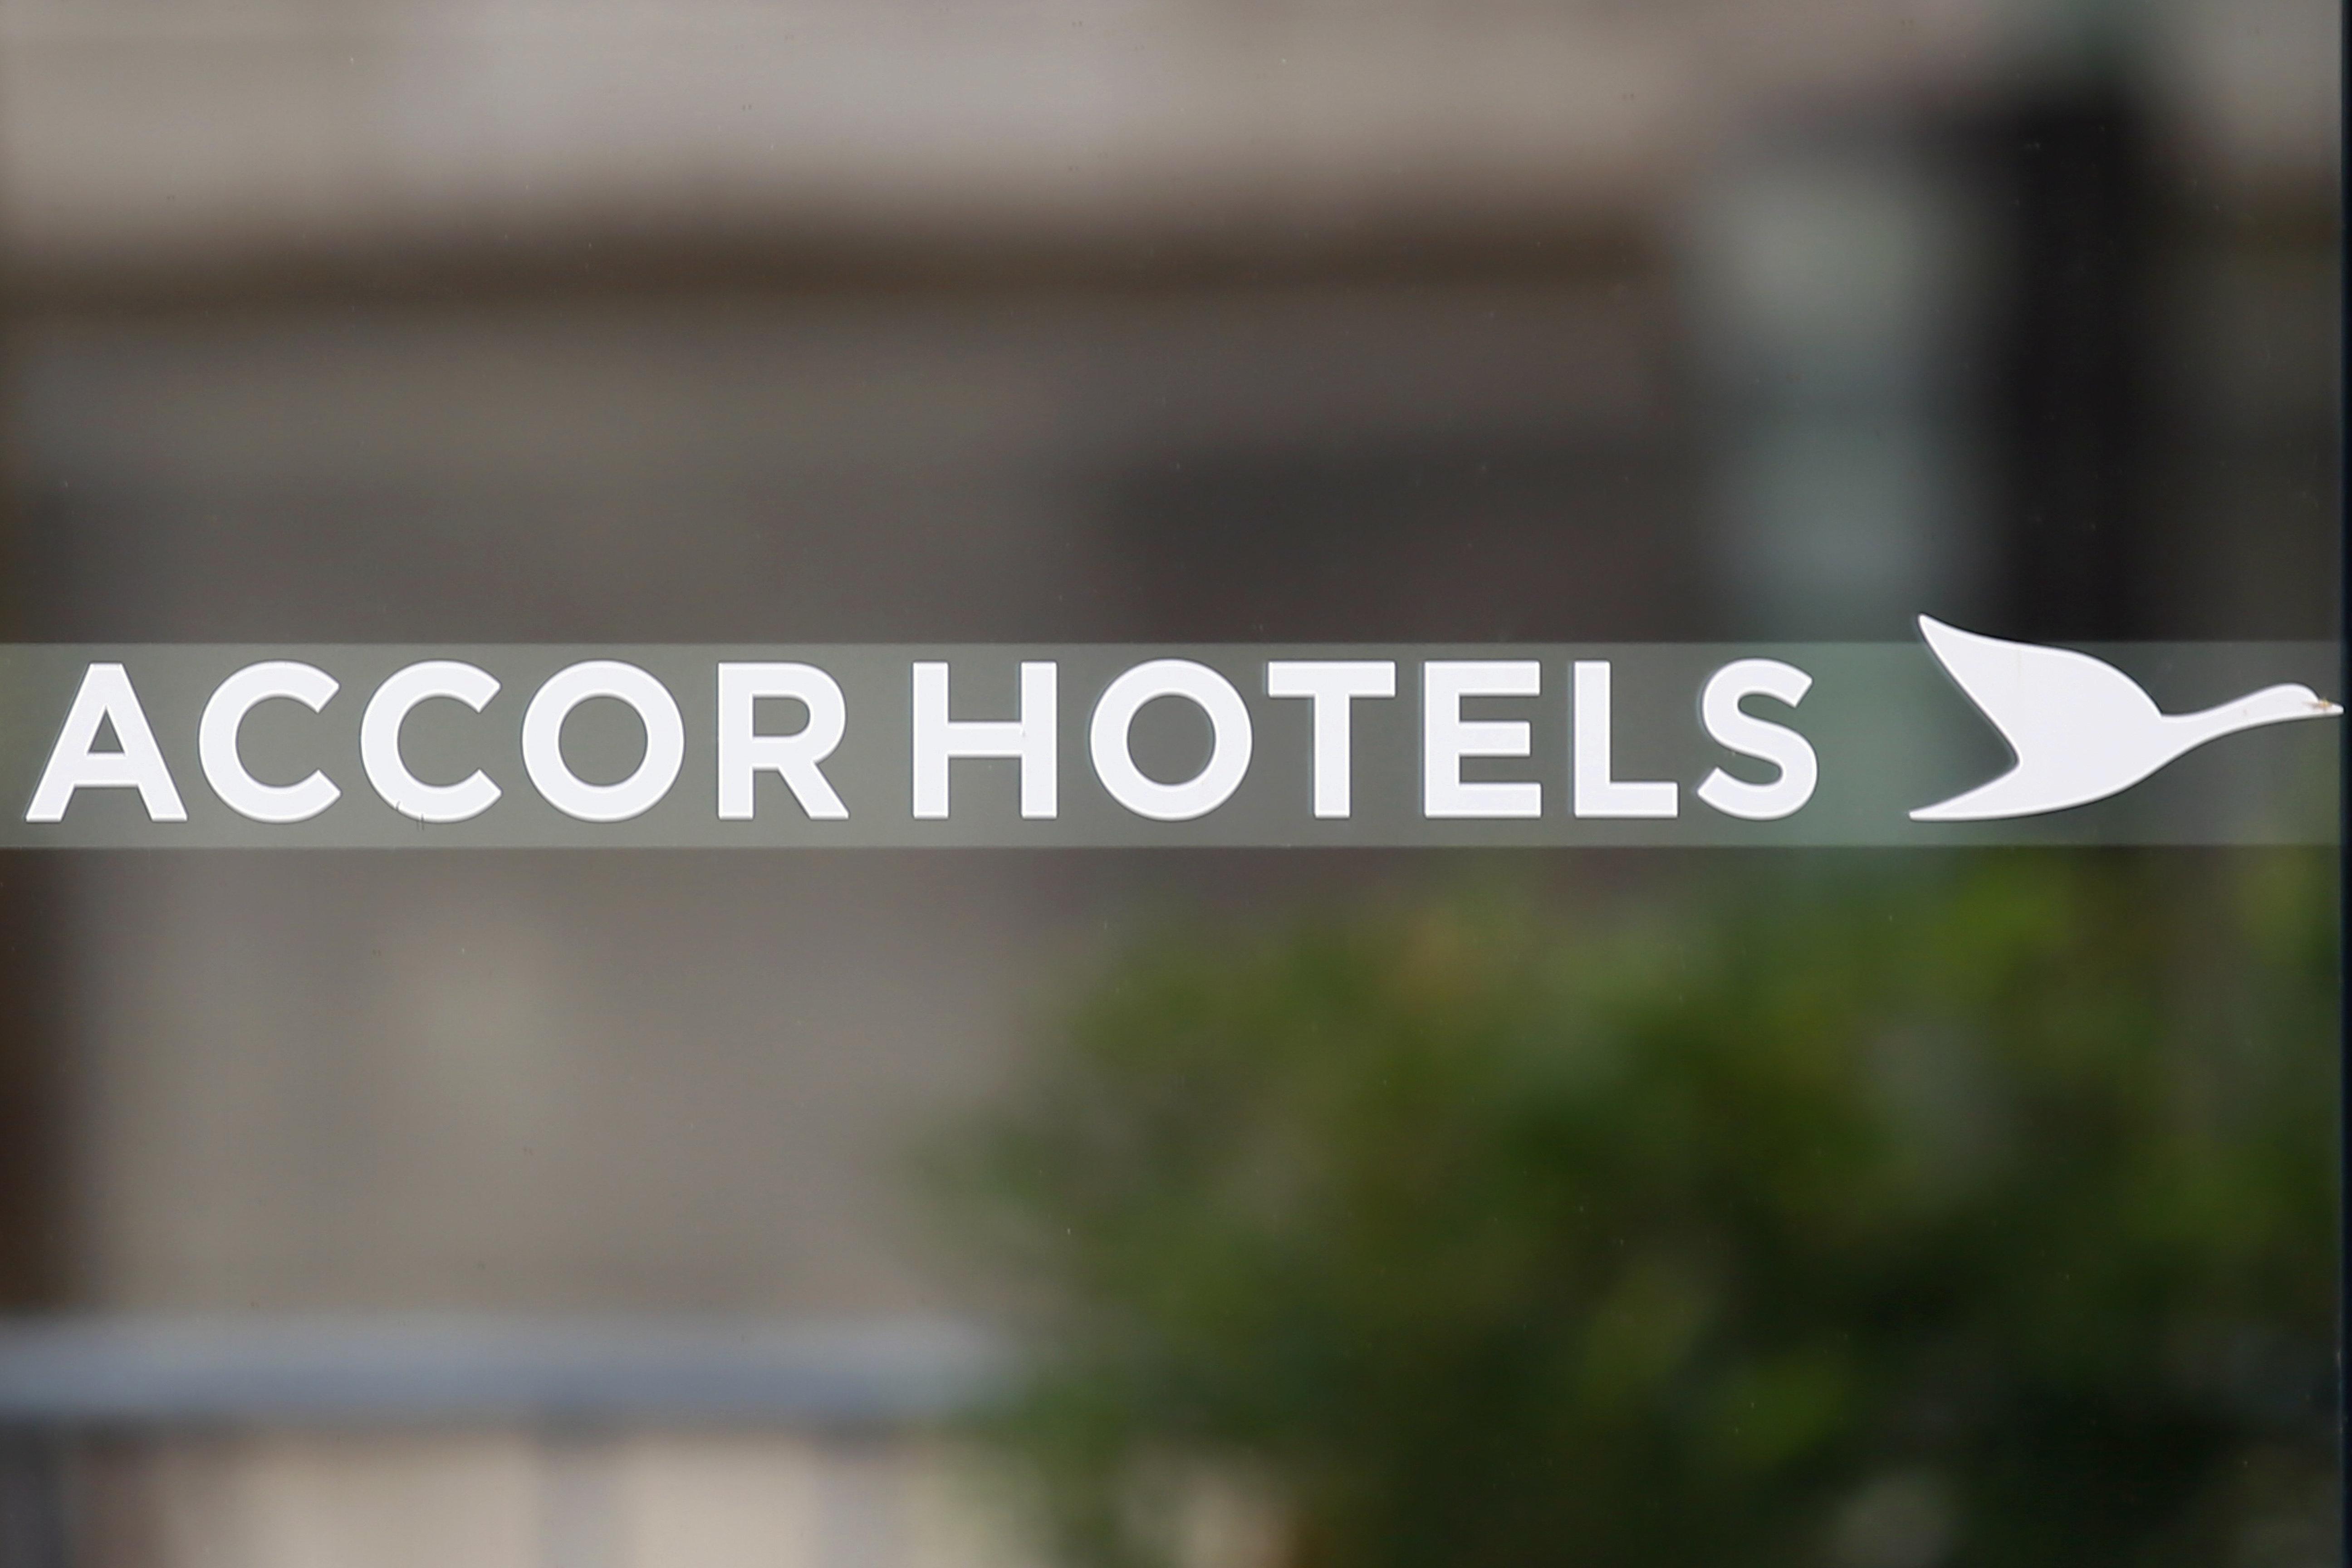 Le Mercure Skikda renforce la présence du groupe Accor Hotels en